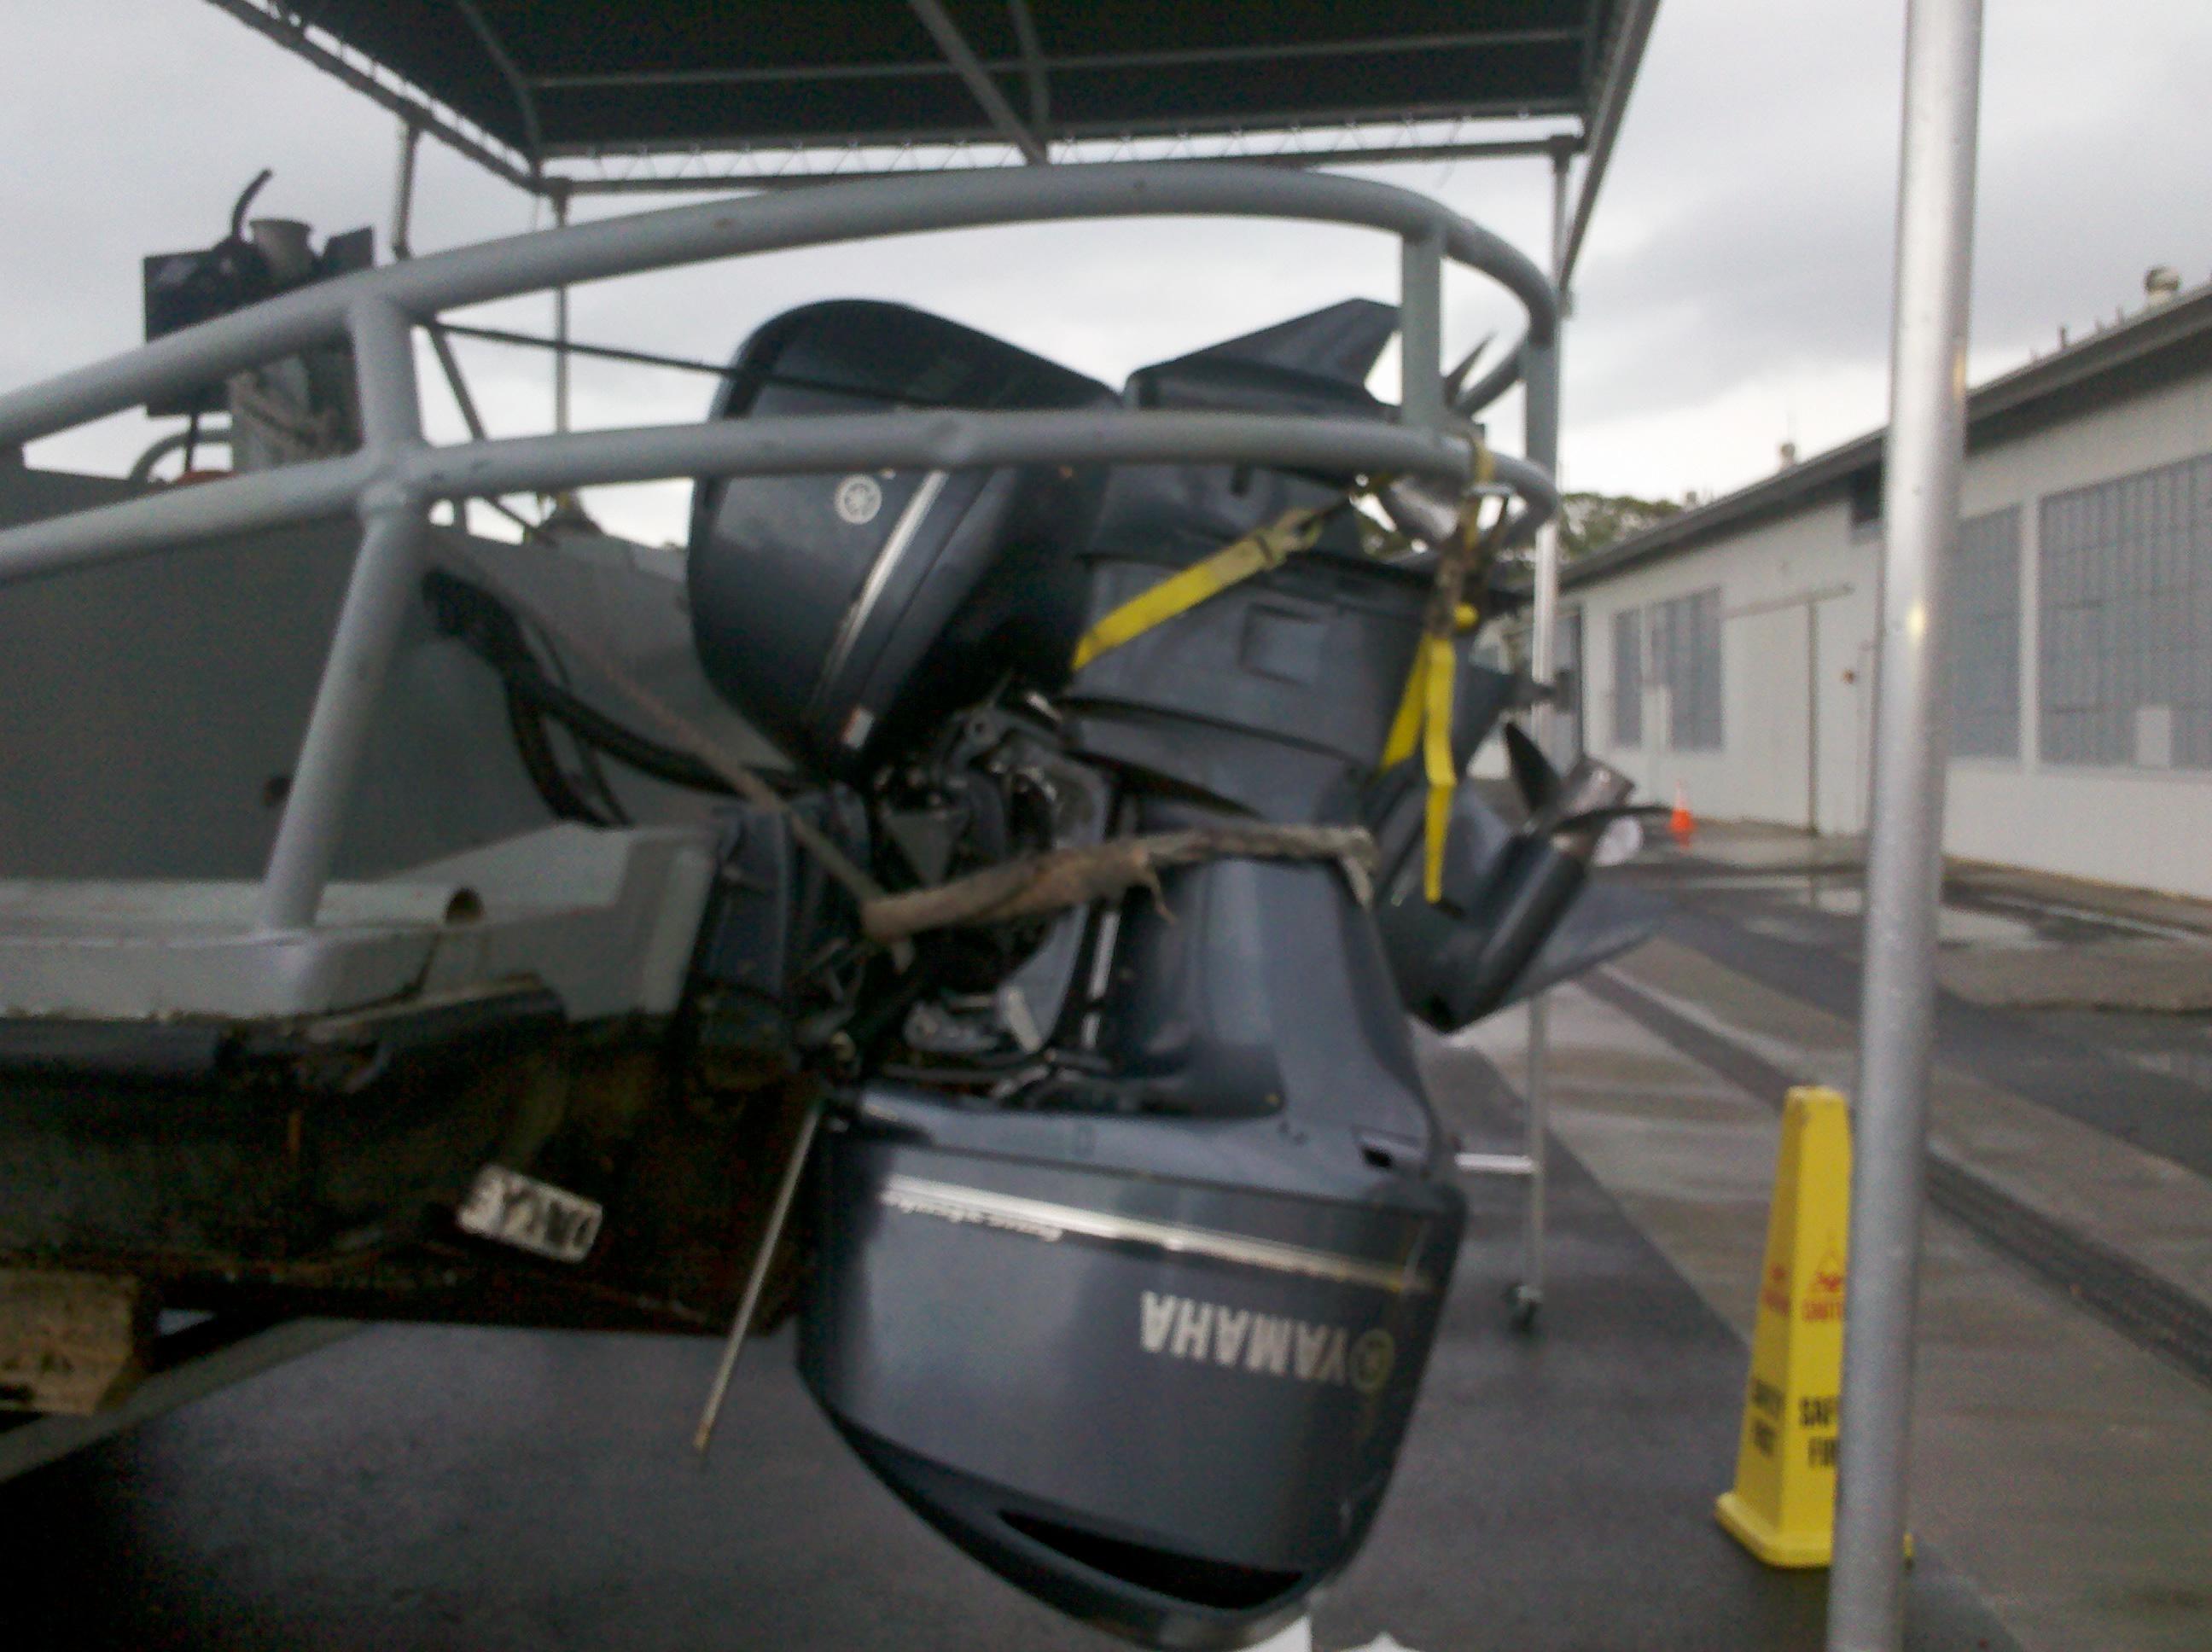 Tangled Yamaha Outboard Motor